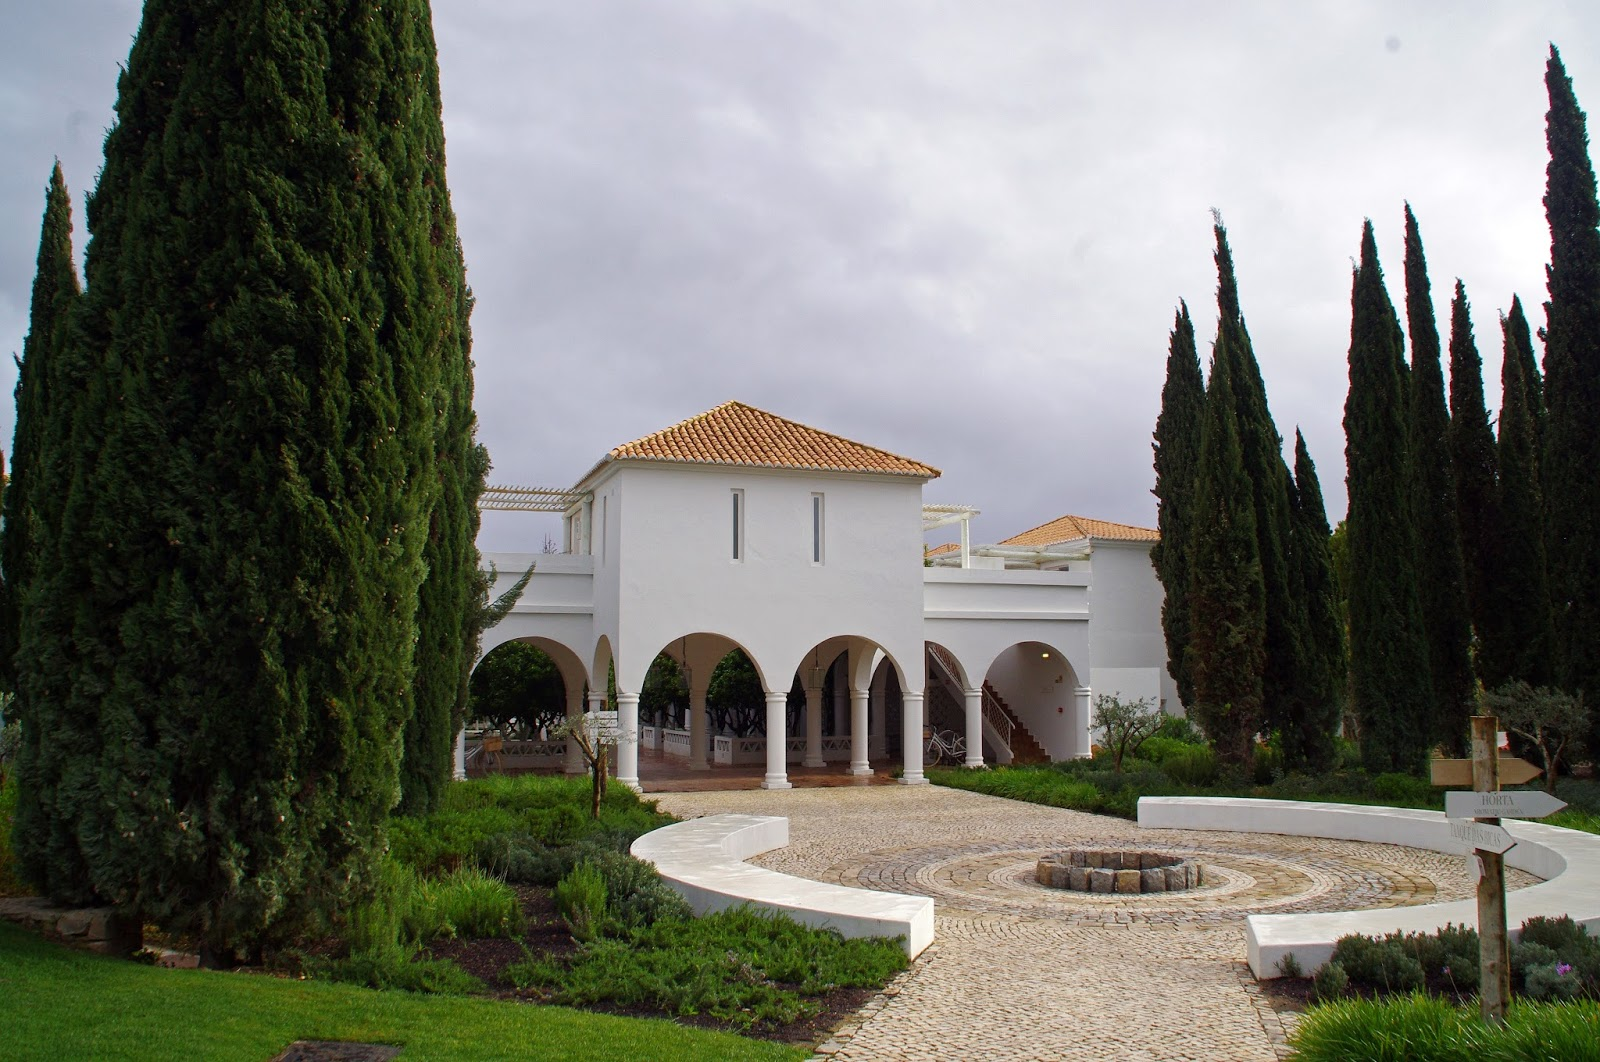 Vila Monte Farm House Portugal Grounds